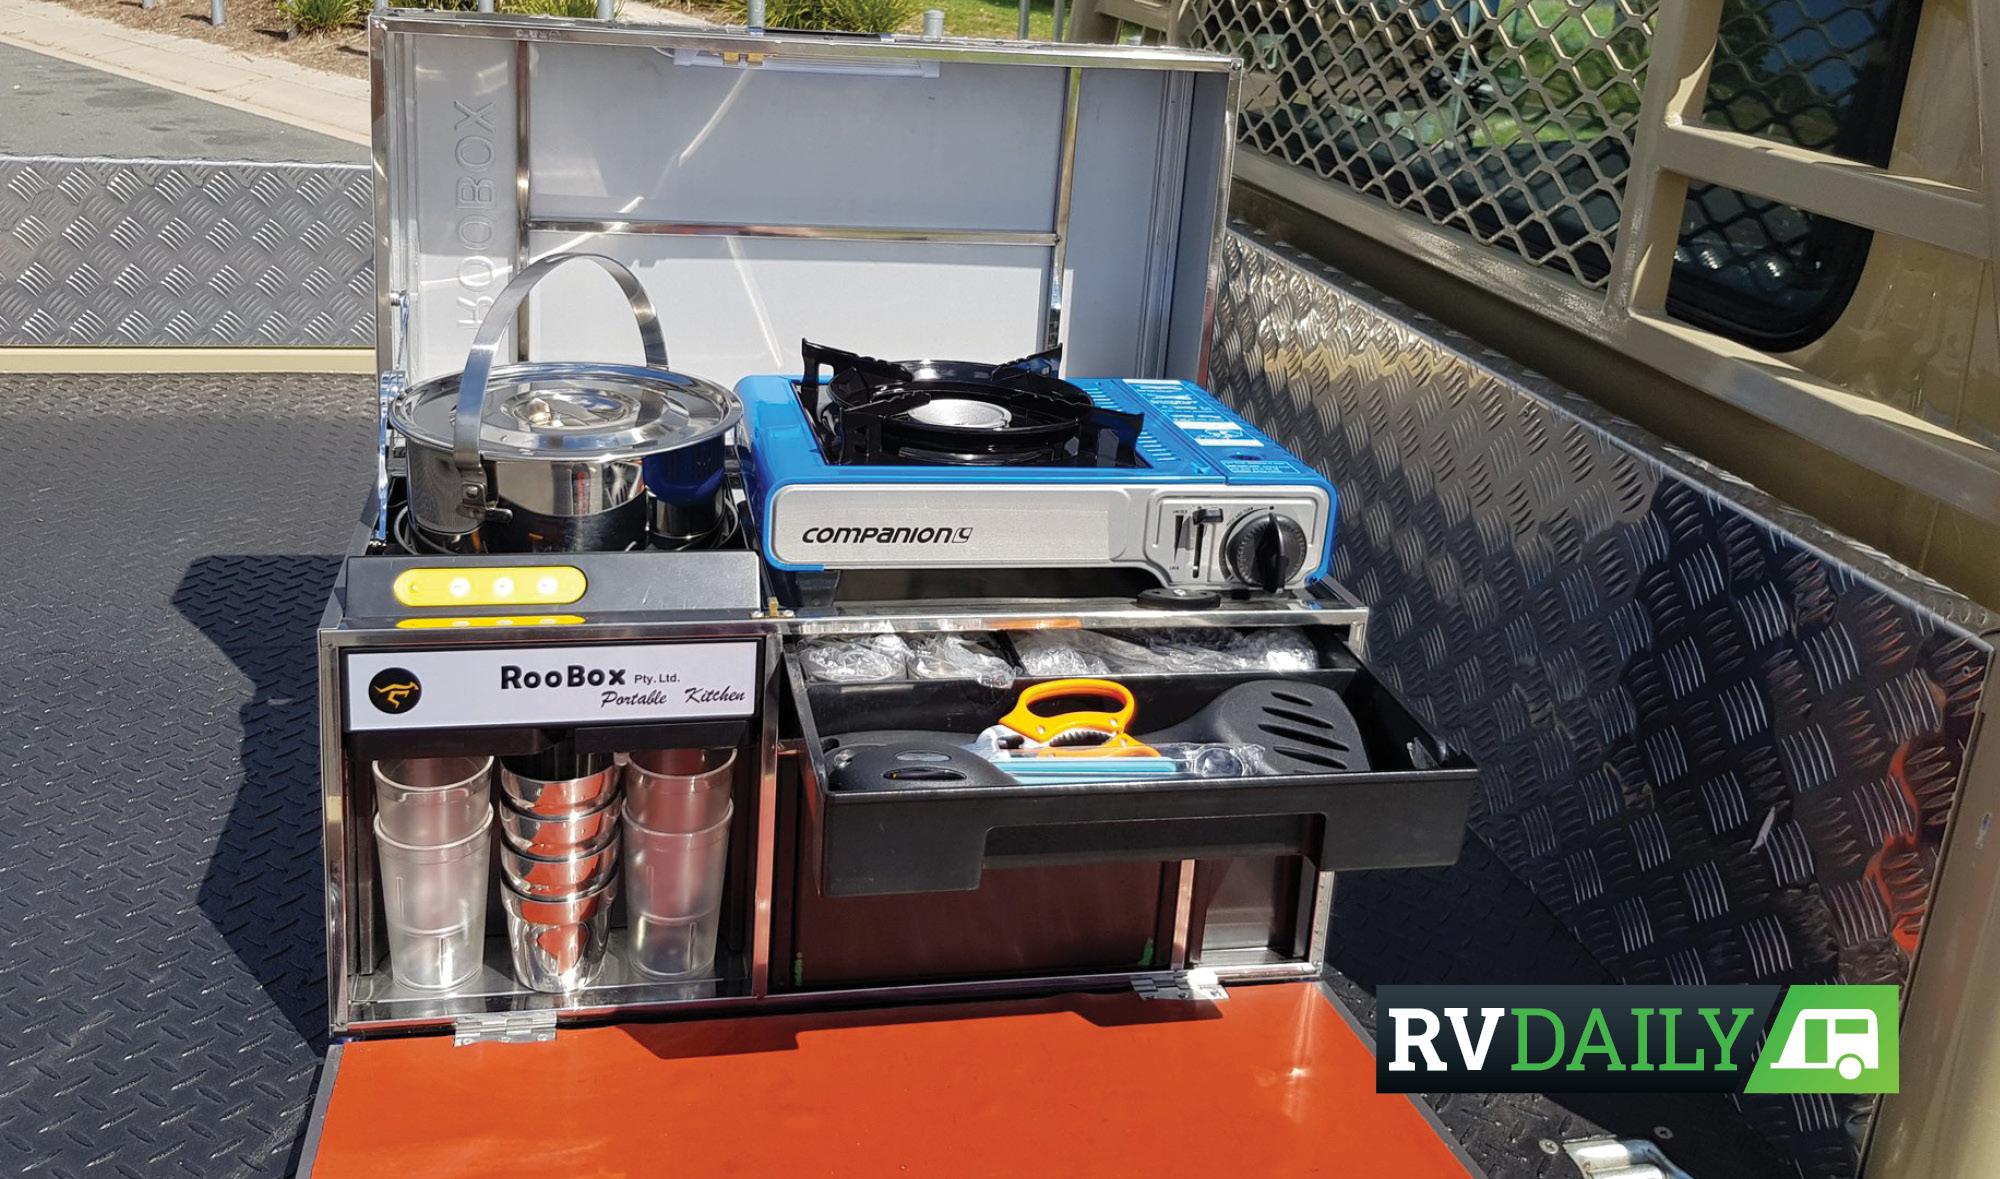 Kookabox Compact Portable Kitchen